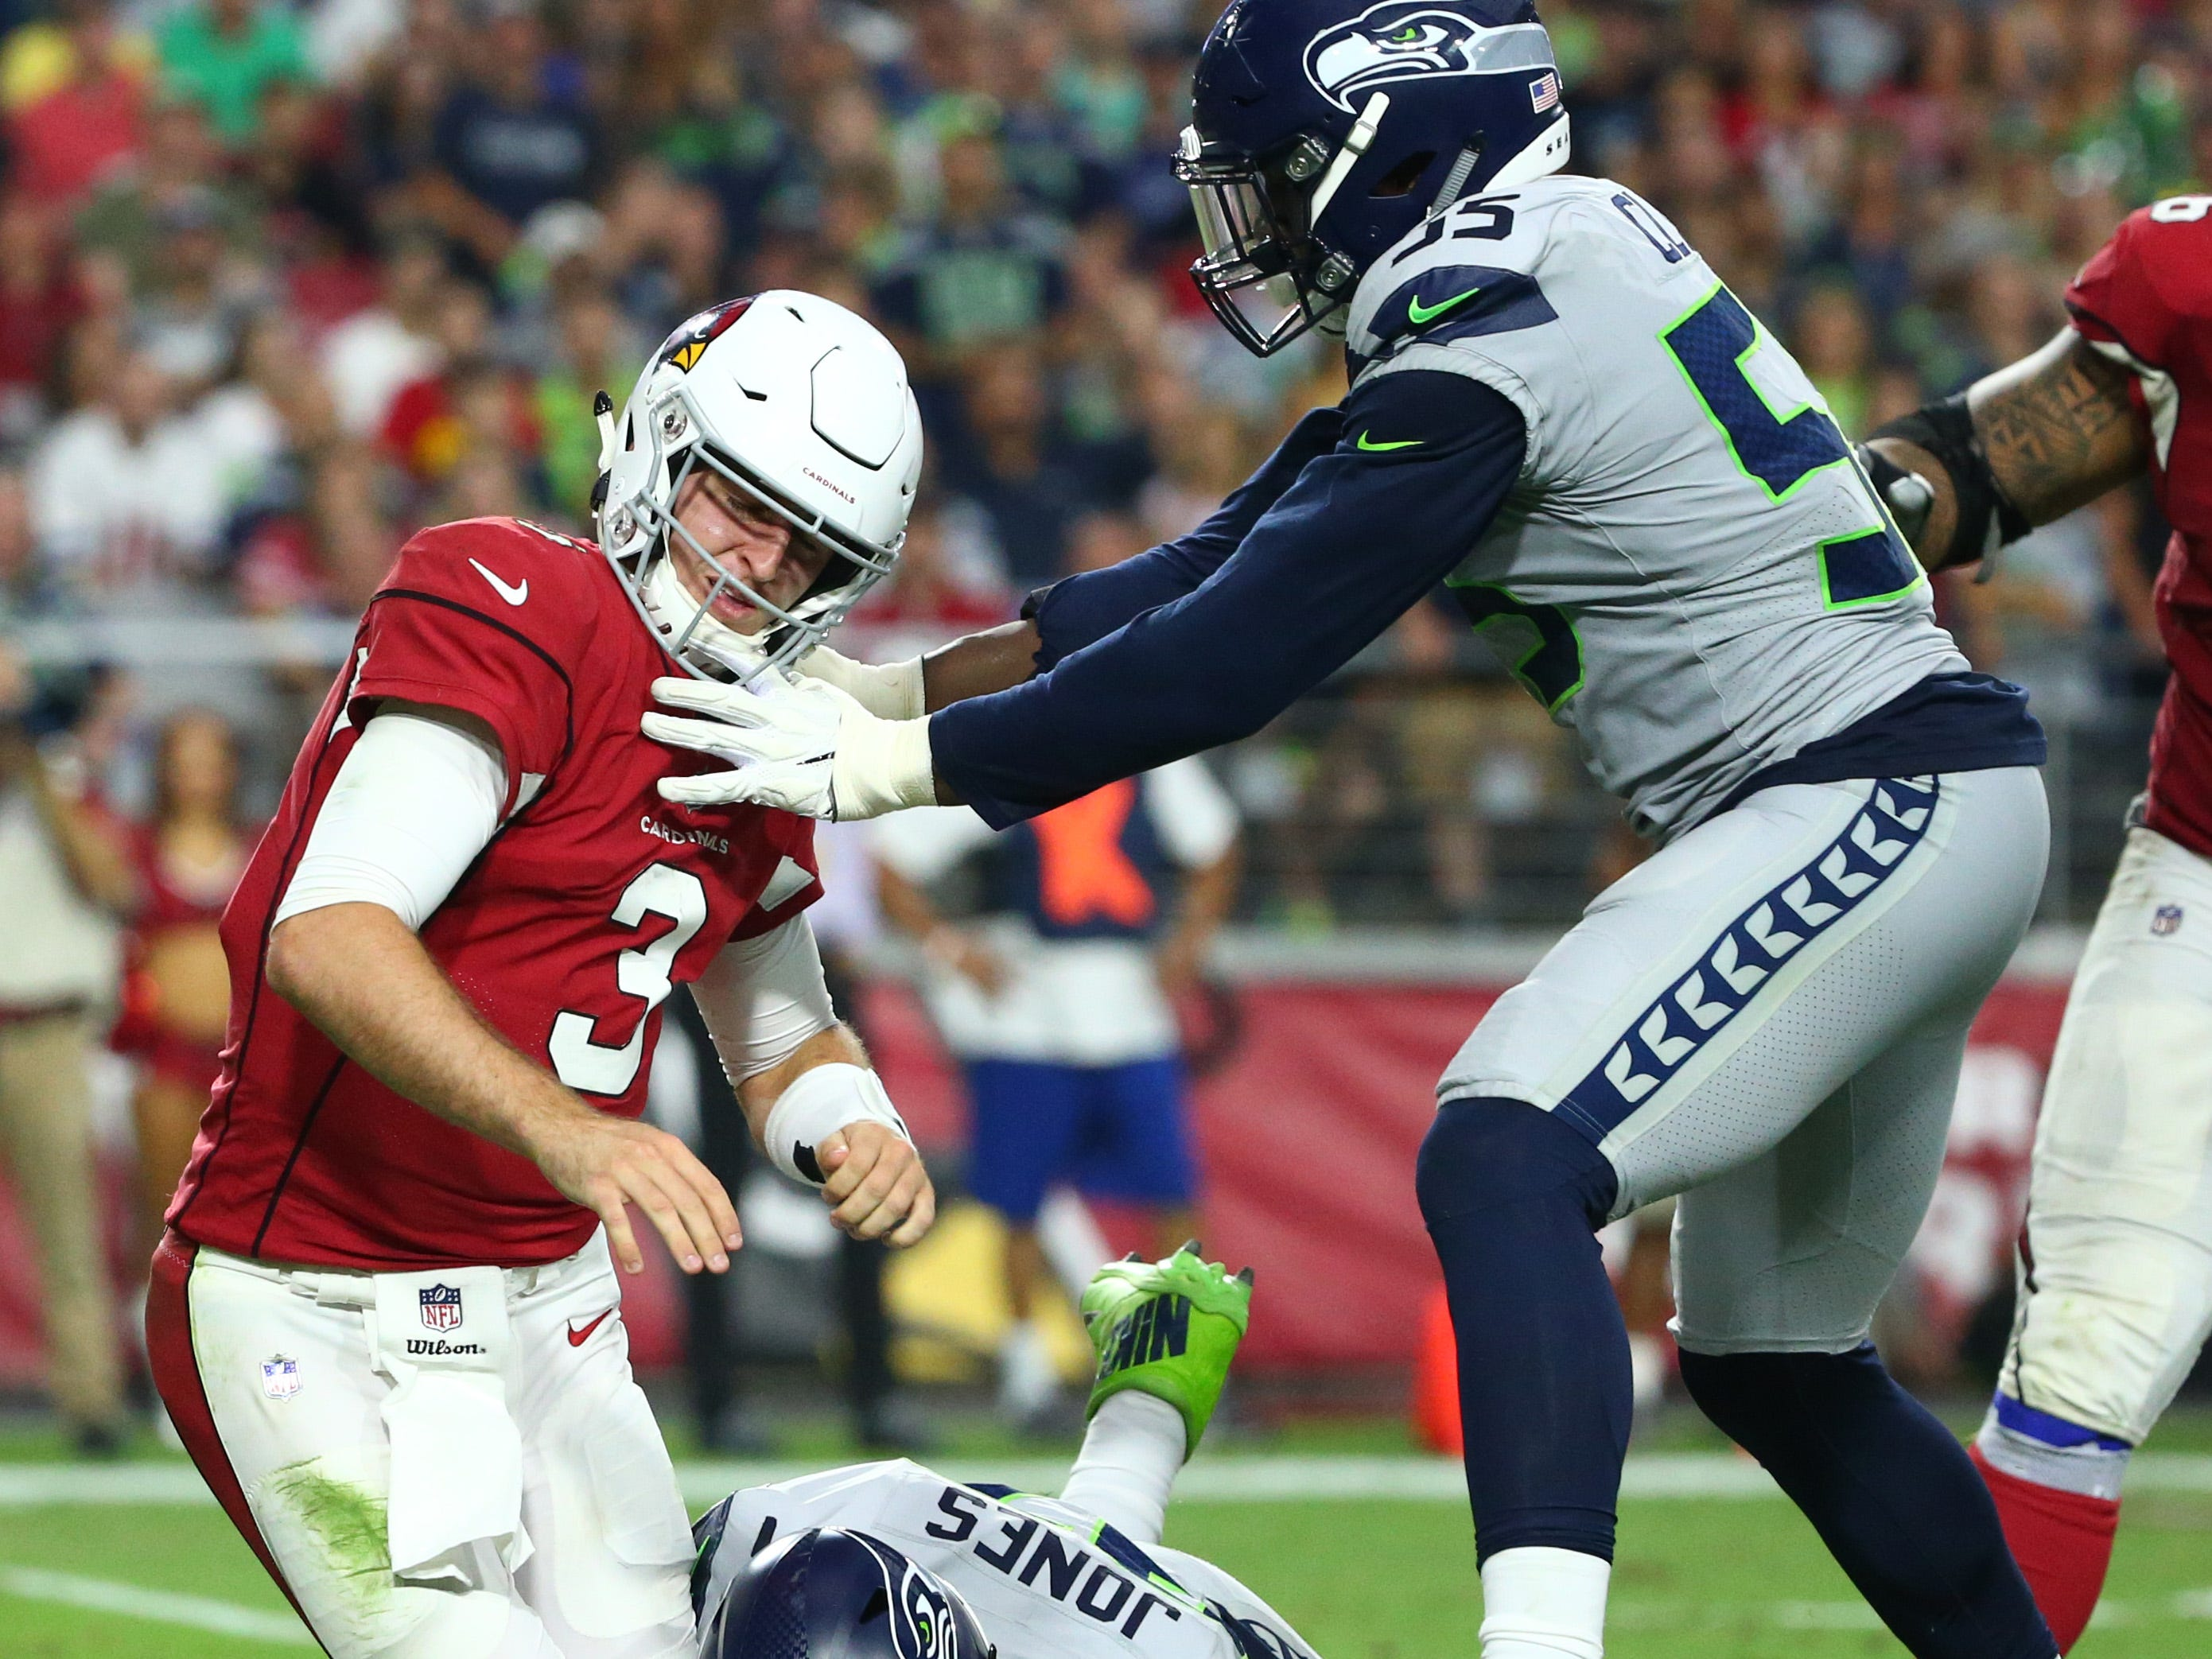 Arizona Cardinals quarterback Josh Rosin is pressured by the eattle Seahawks in the second half at State Farm Stadium in Glendale, Ariz.